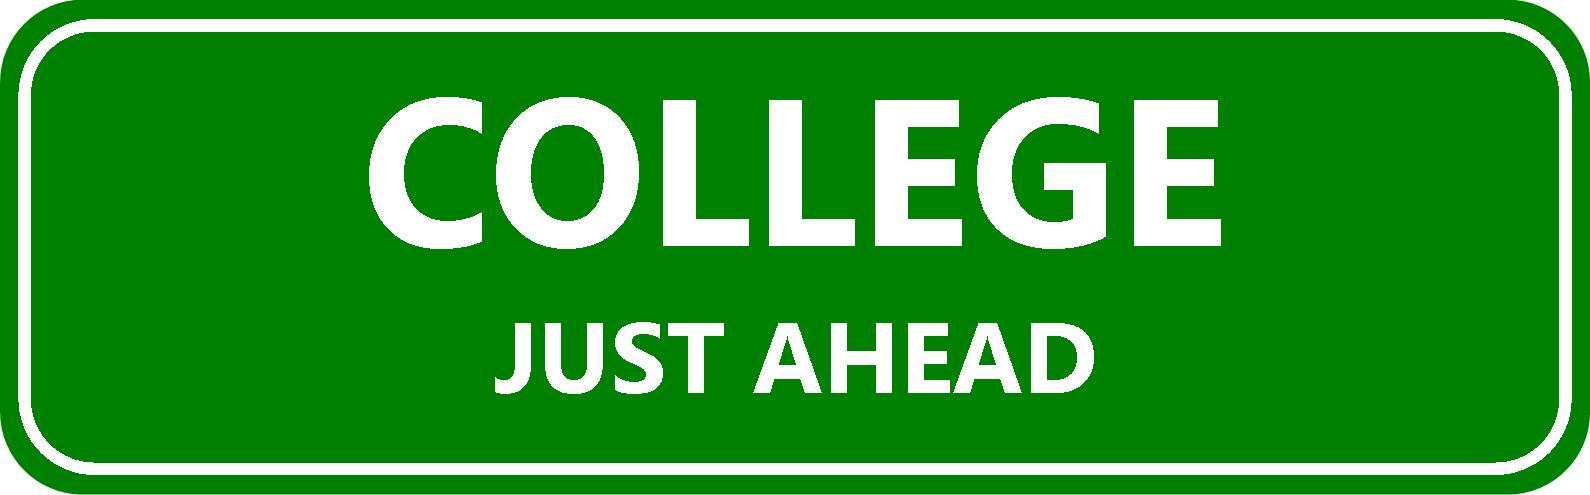 1590x495 College Ahead.jpg